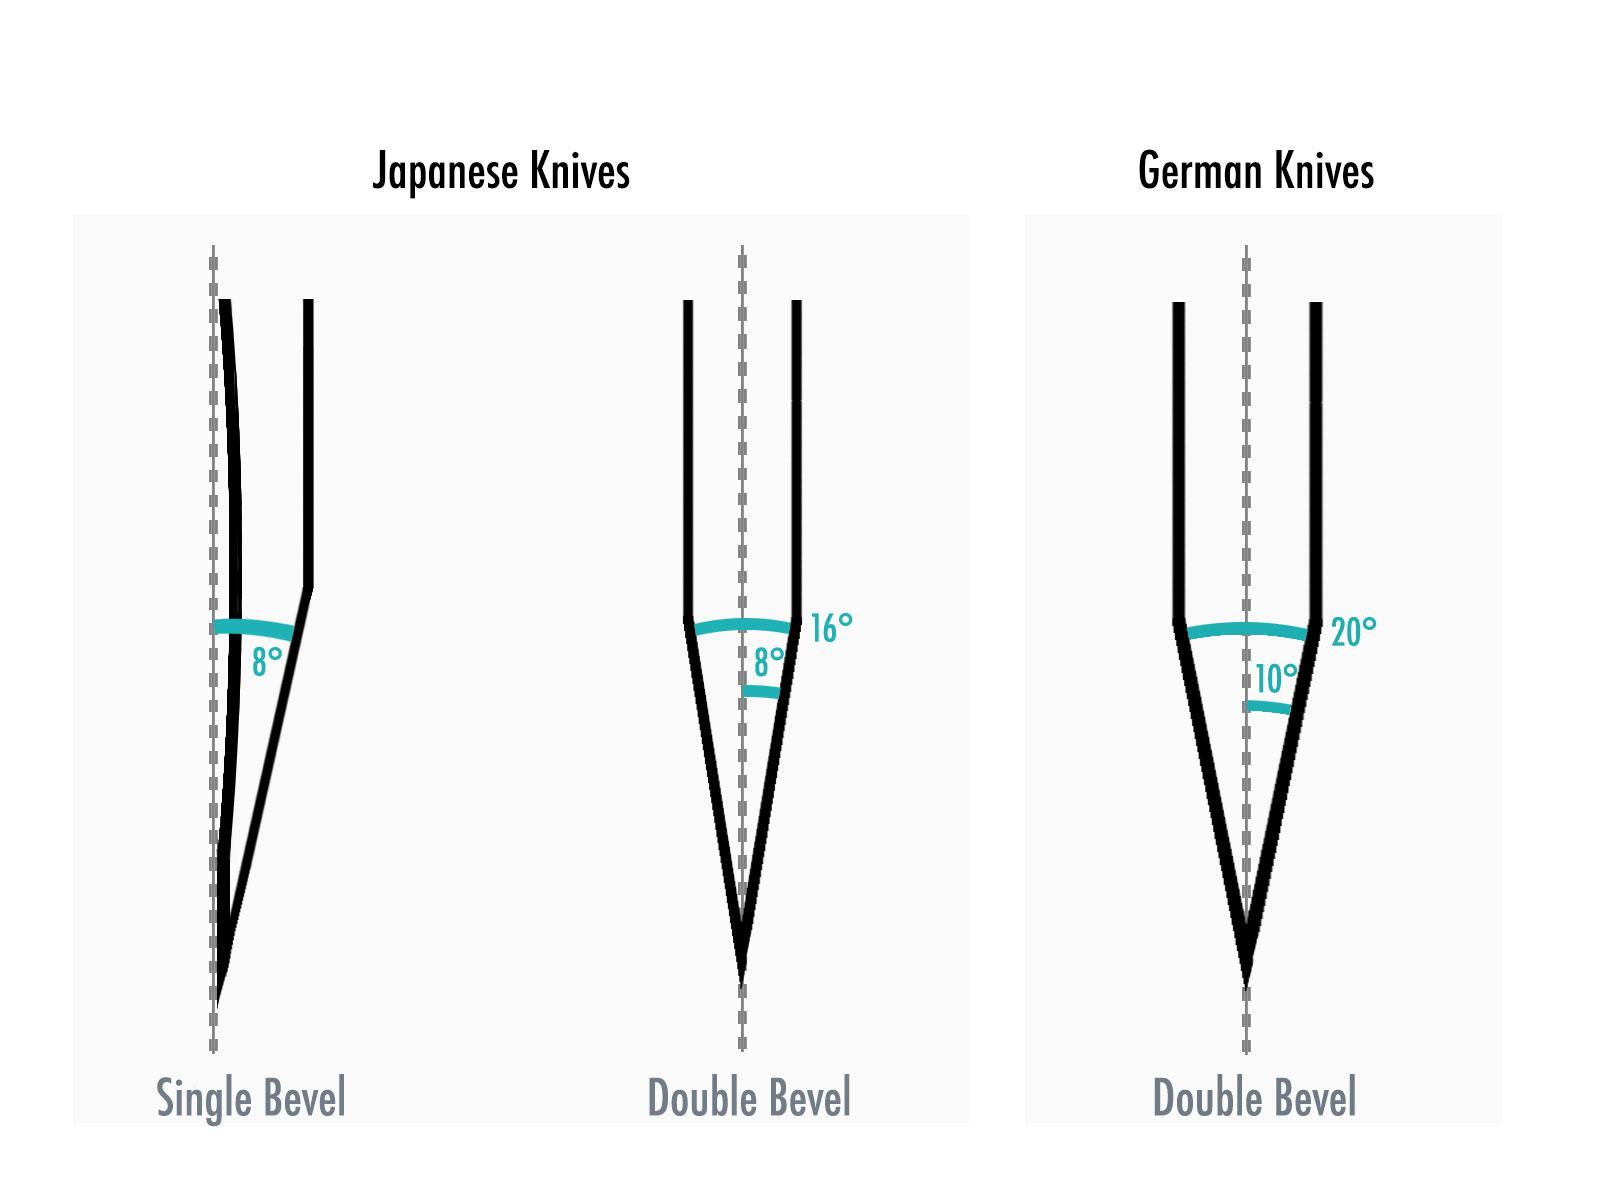 german knives vs japanese knives